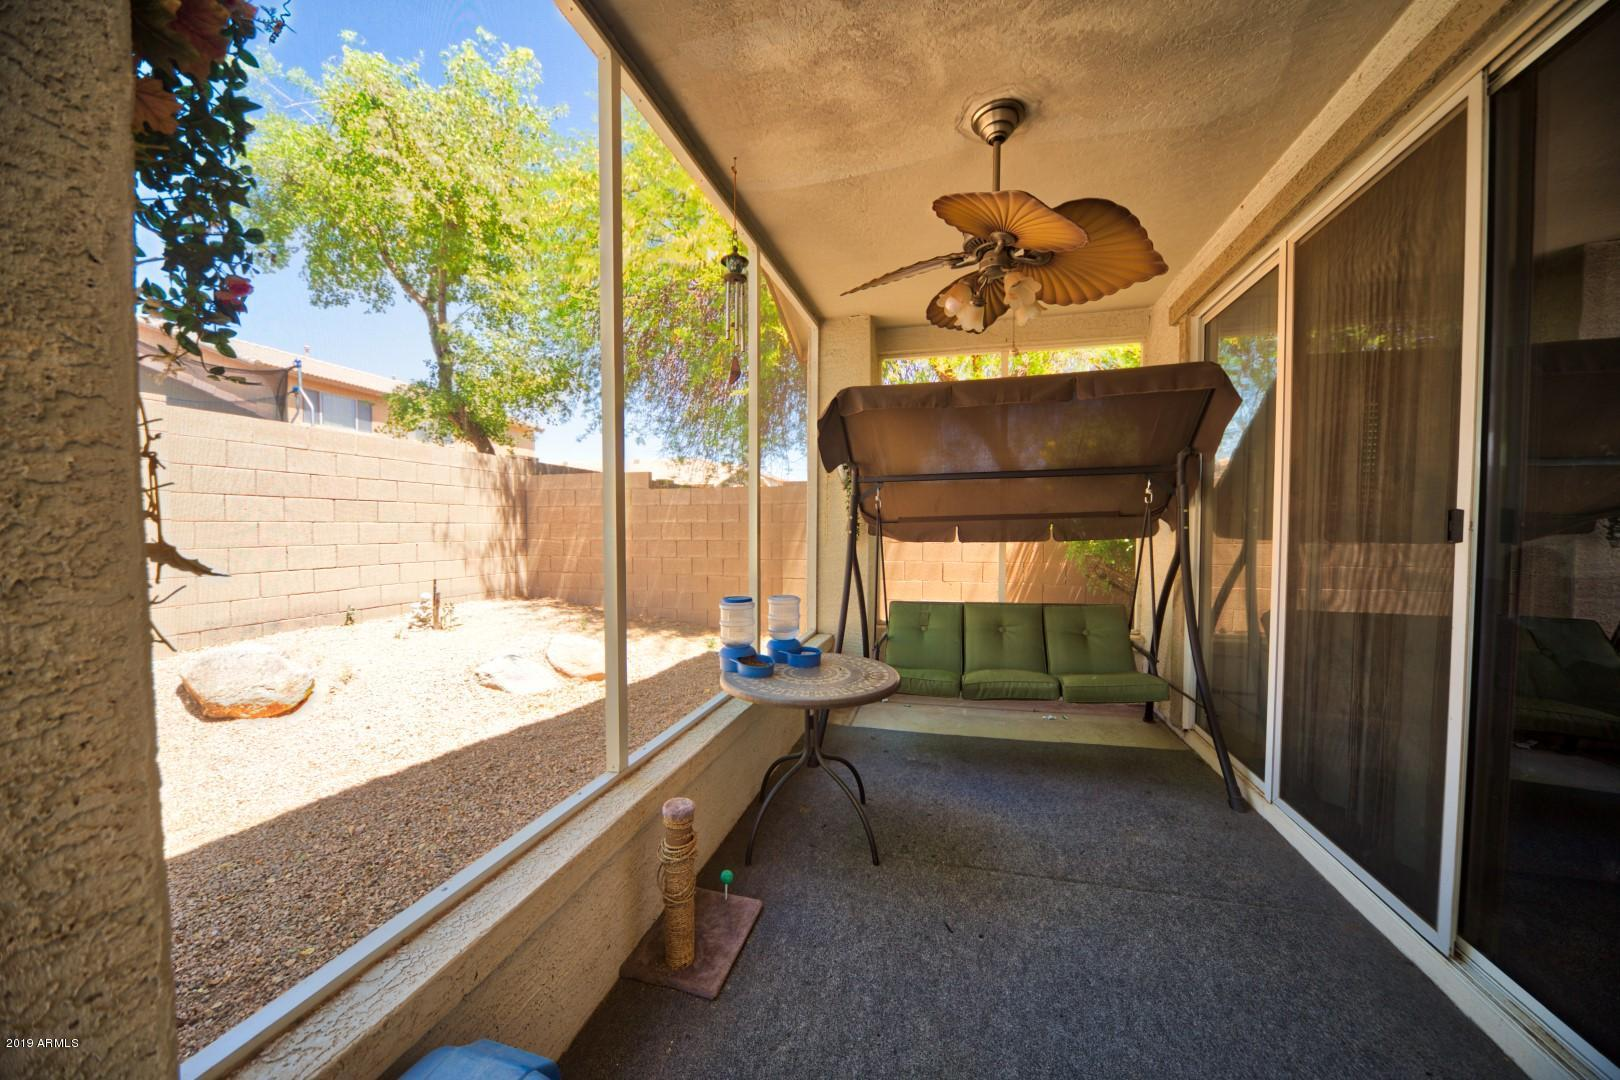 MLS 5871209 14856 W COLUMBINE Drive, Surprise, AZ 85379 Surprise AZ Rancho Gabriela